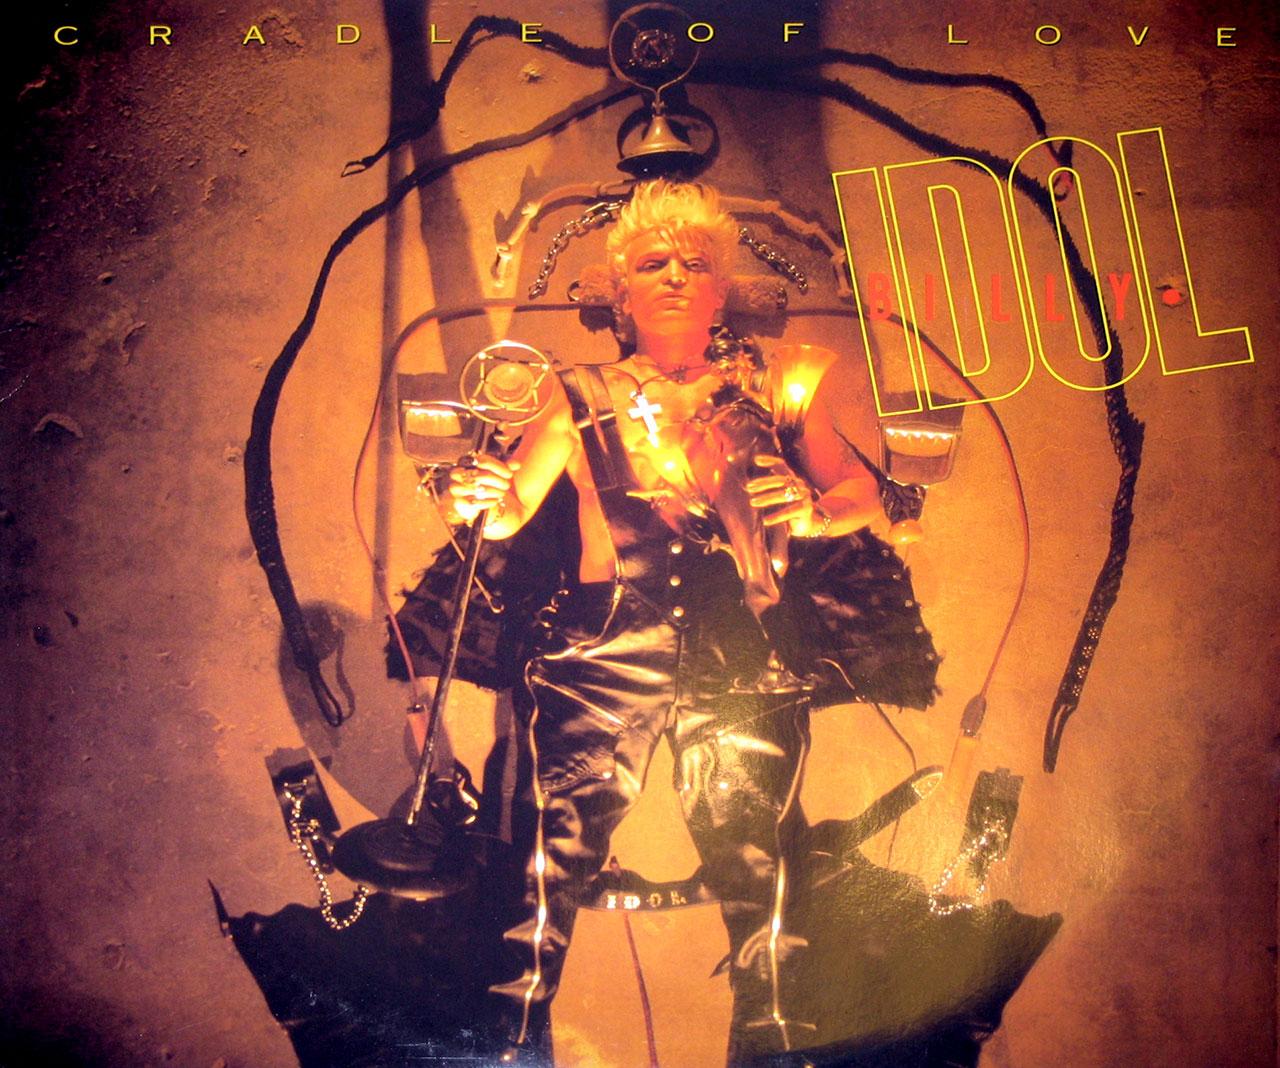 Billy-Idol-Cradle-Love-0157